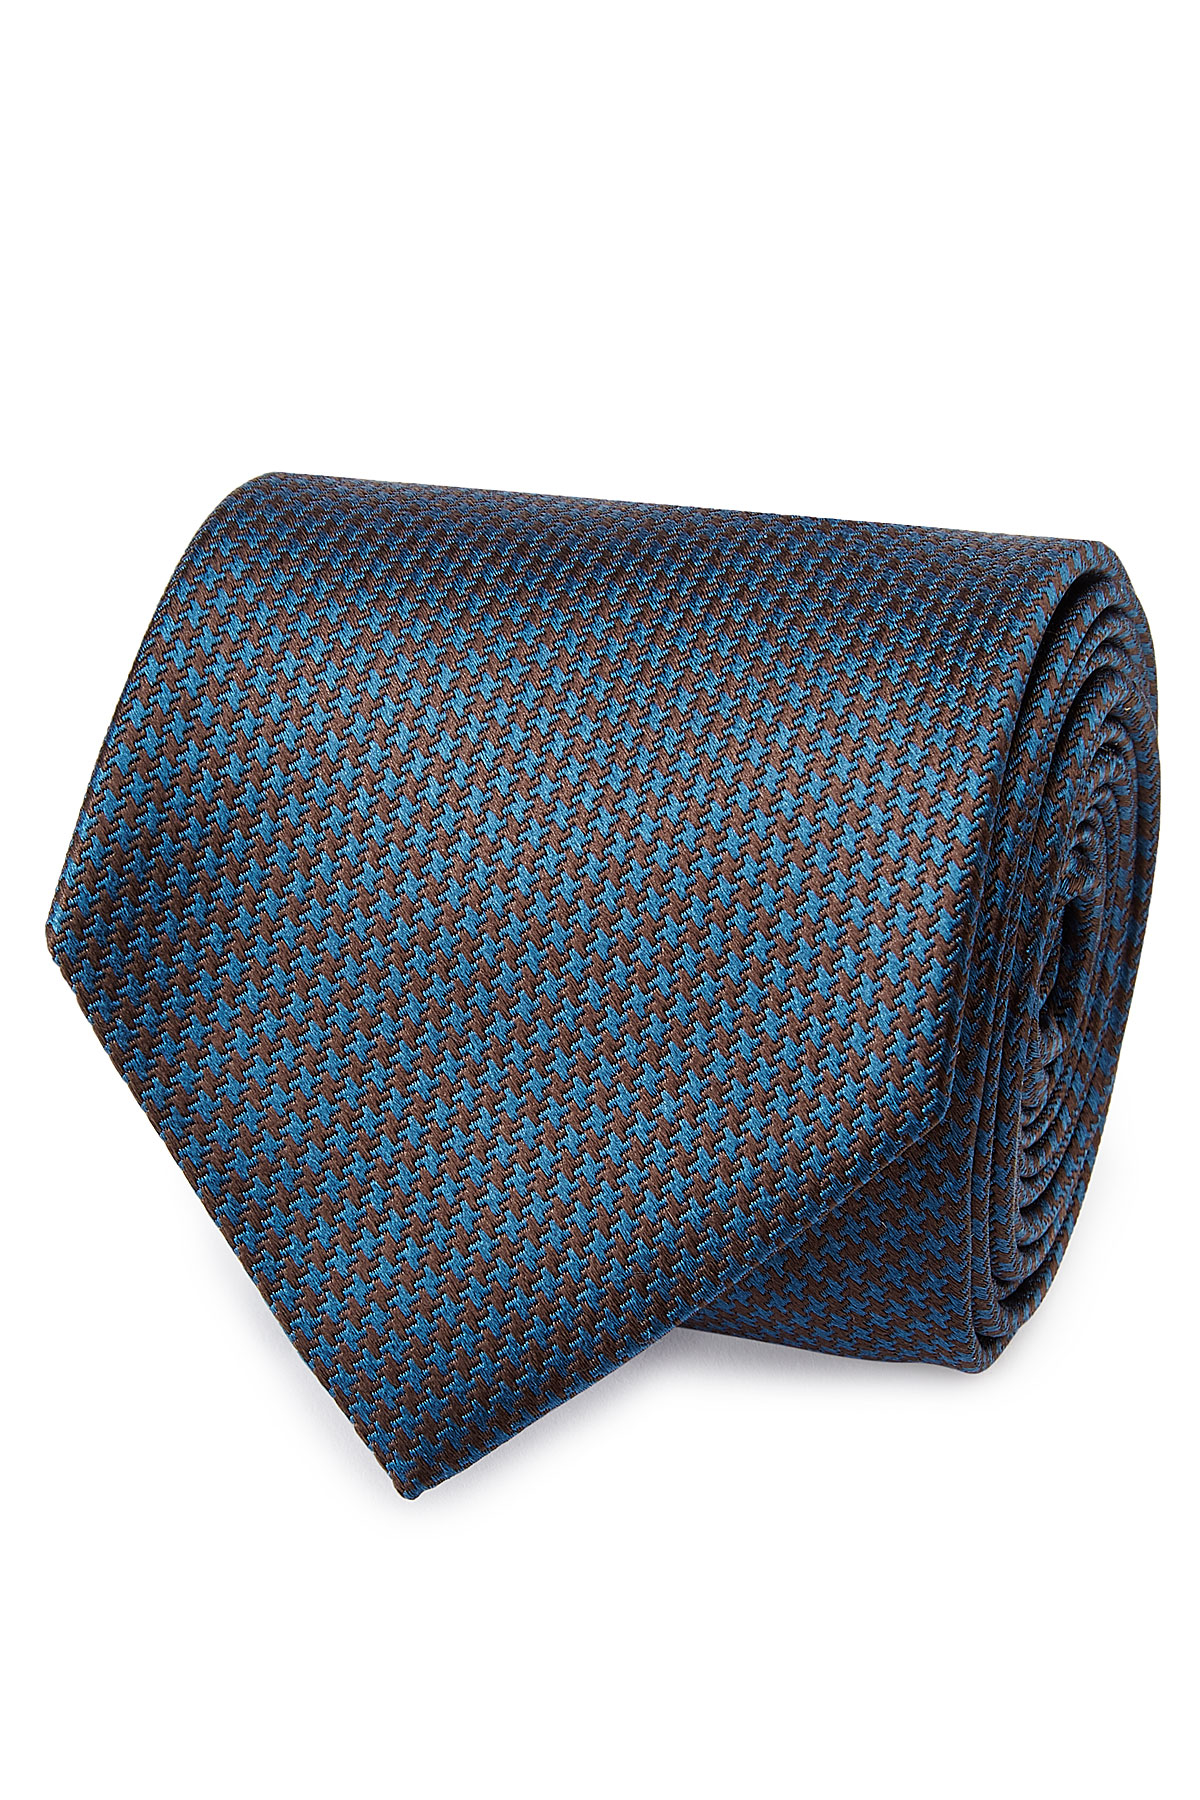 Brioni Woven Silk Tie Blue In Blue For Men Lyst